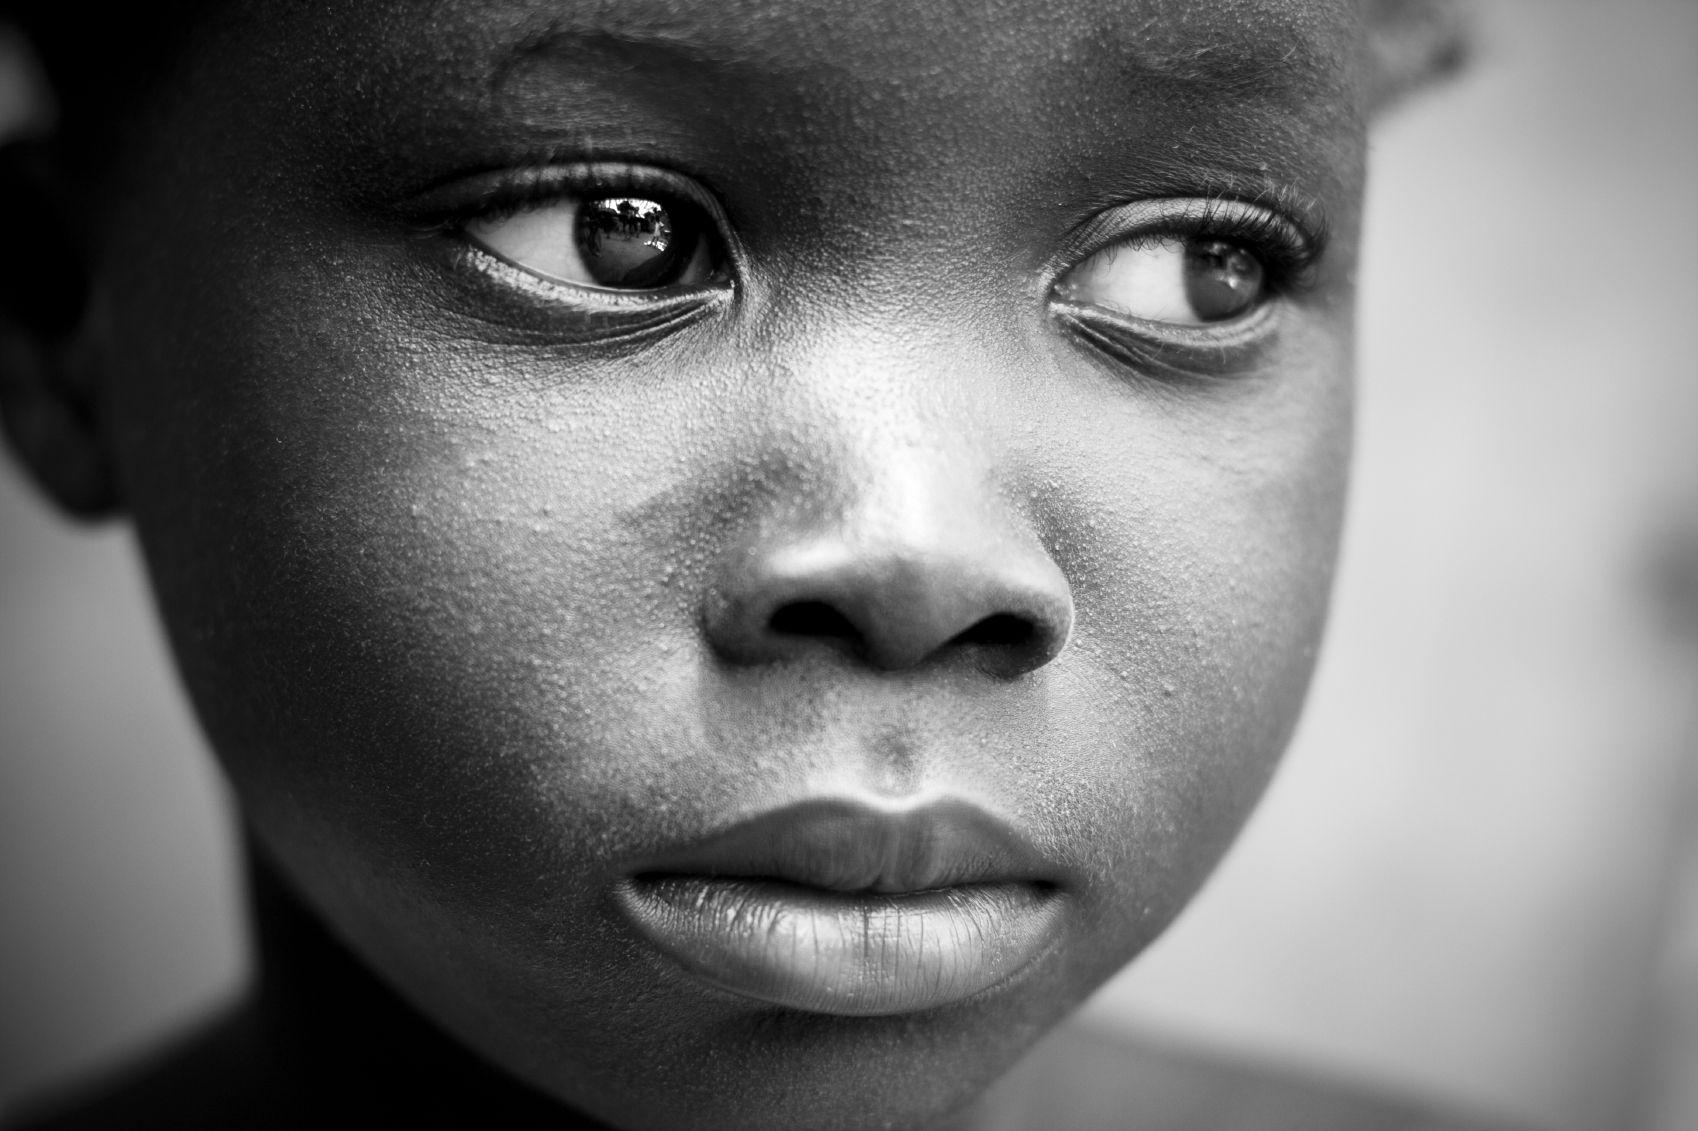 Sad african children